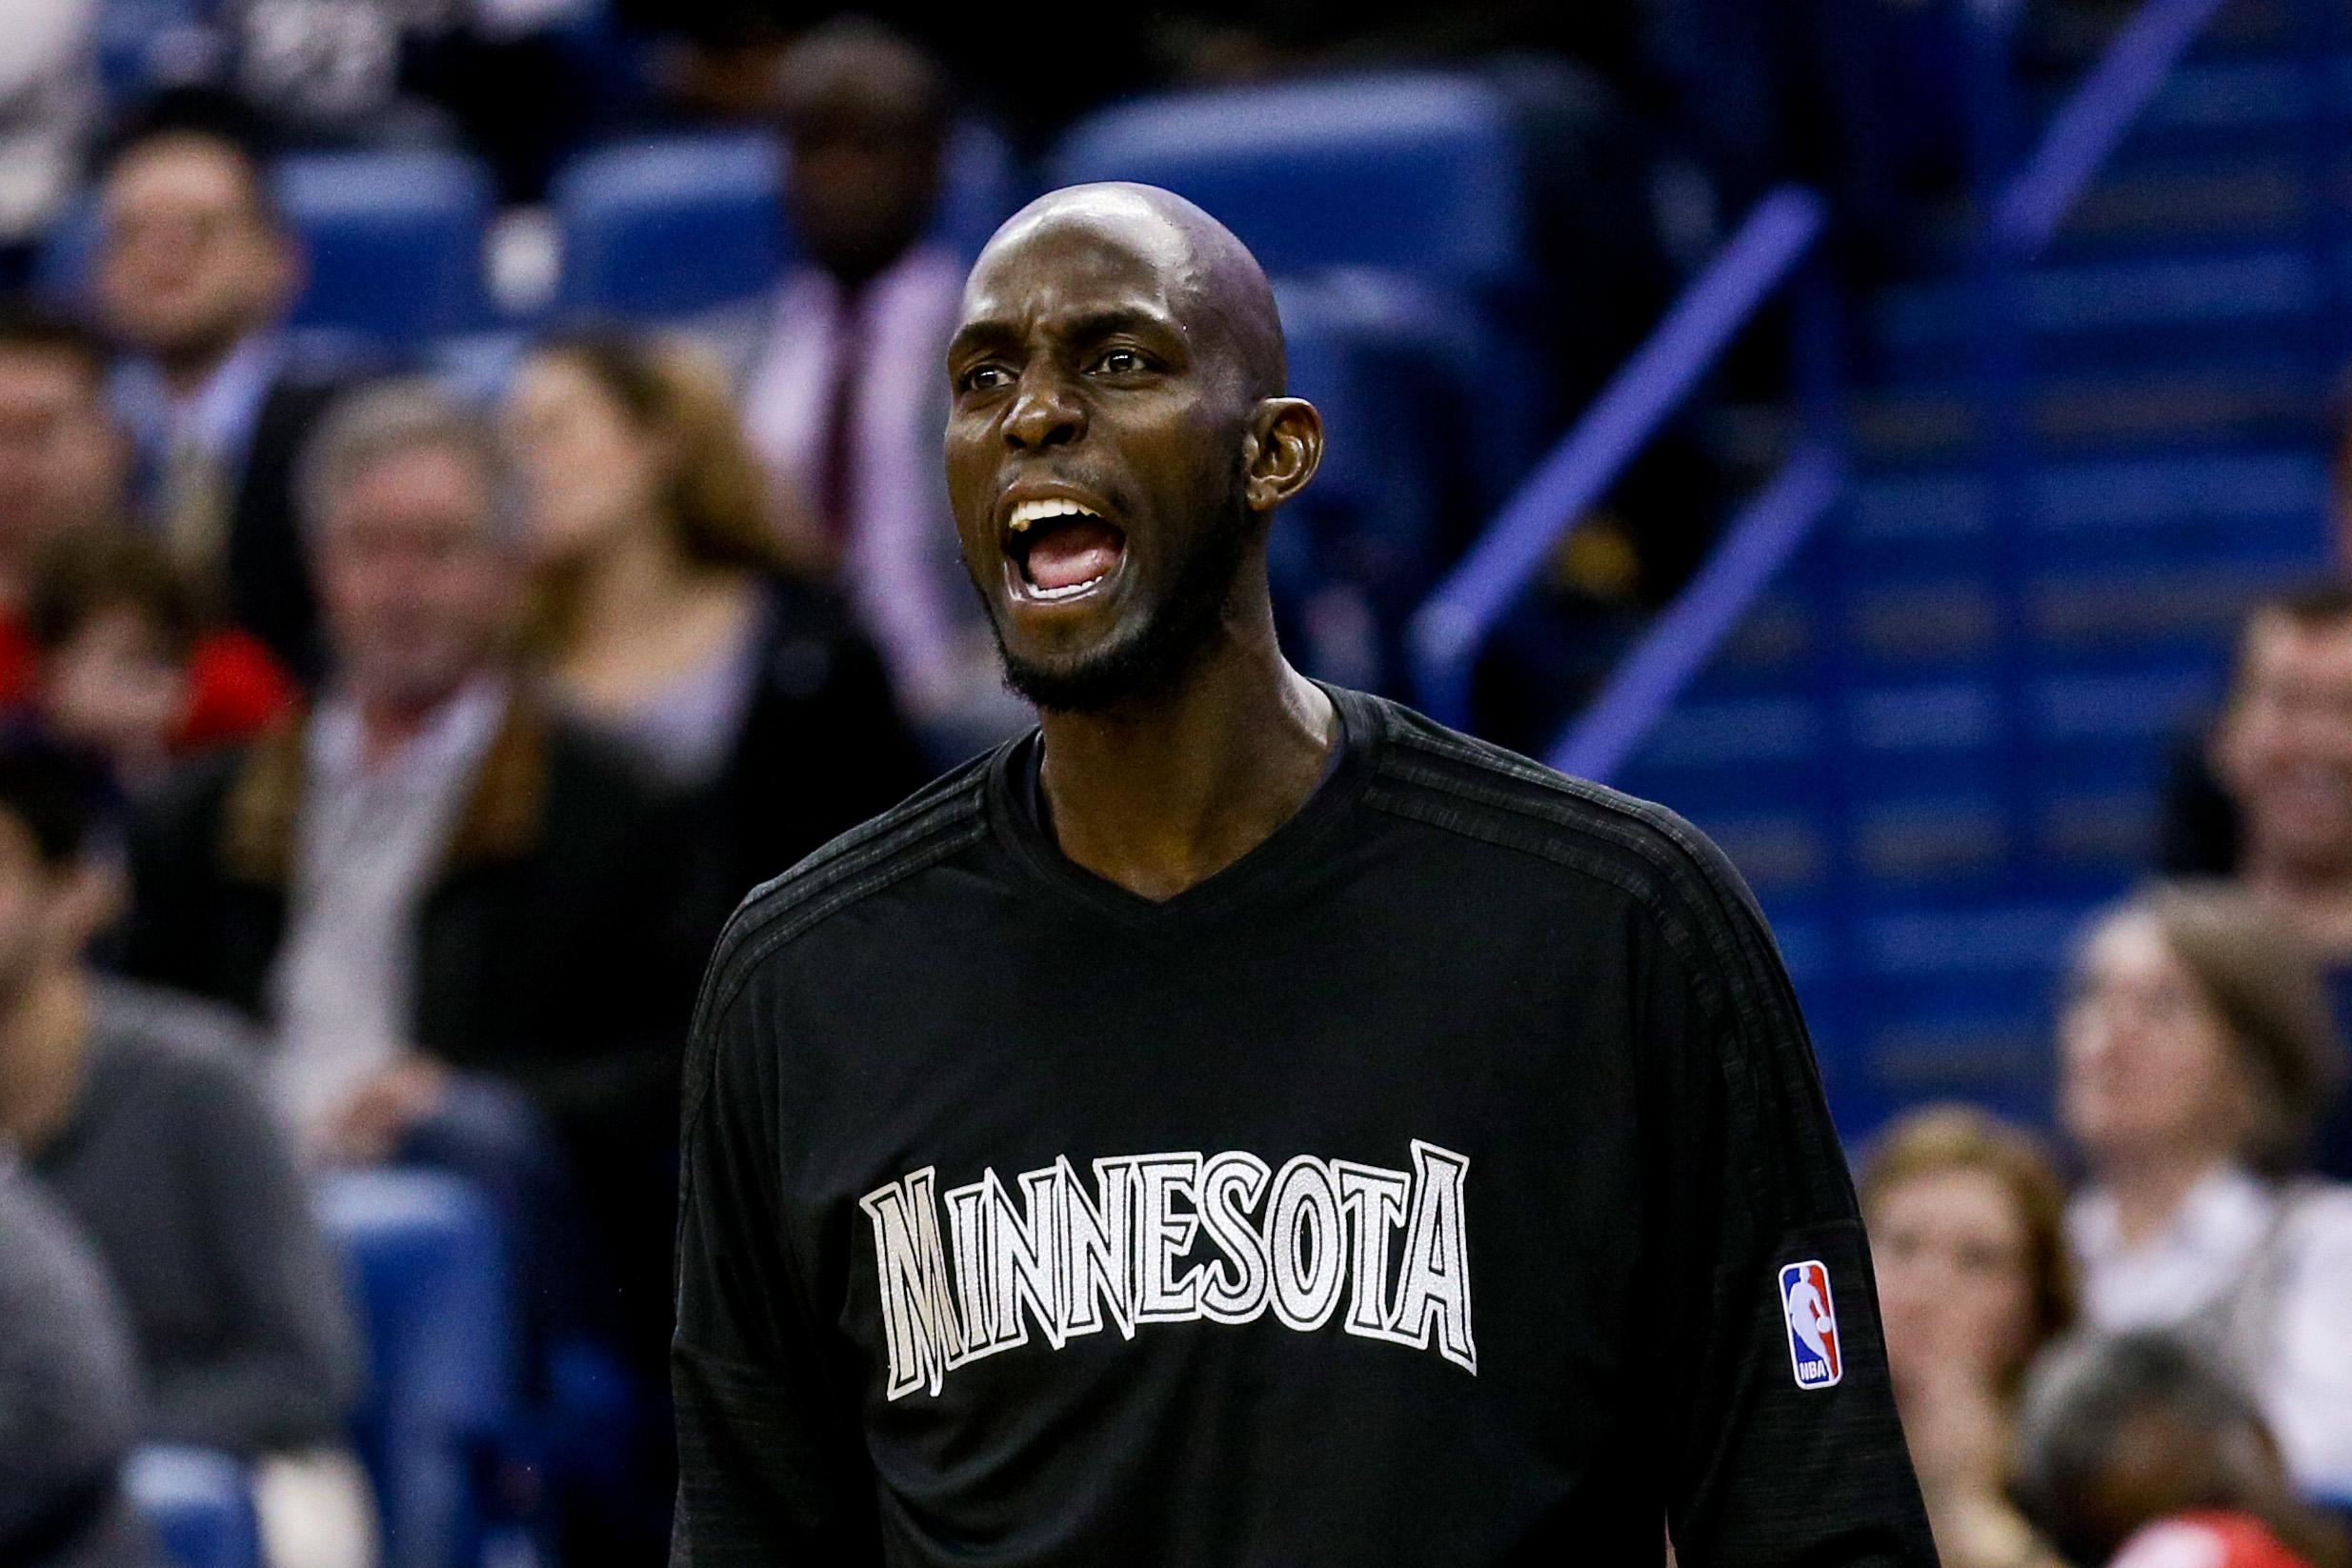 NBA: Minnesota Timberwolves at New Orleans Pelicans